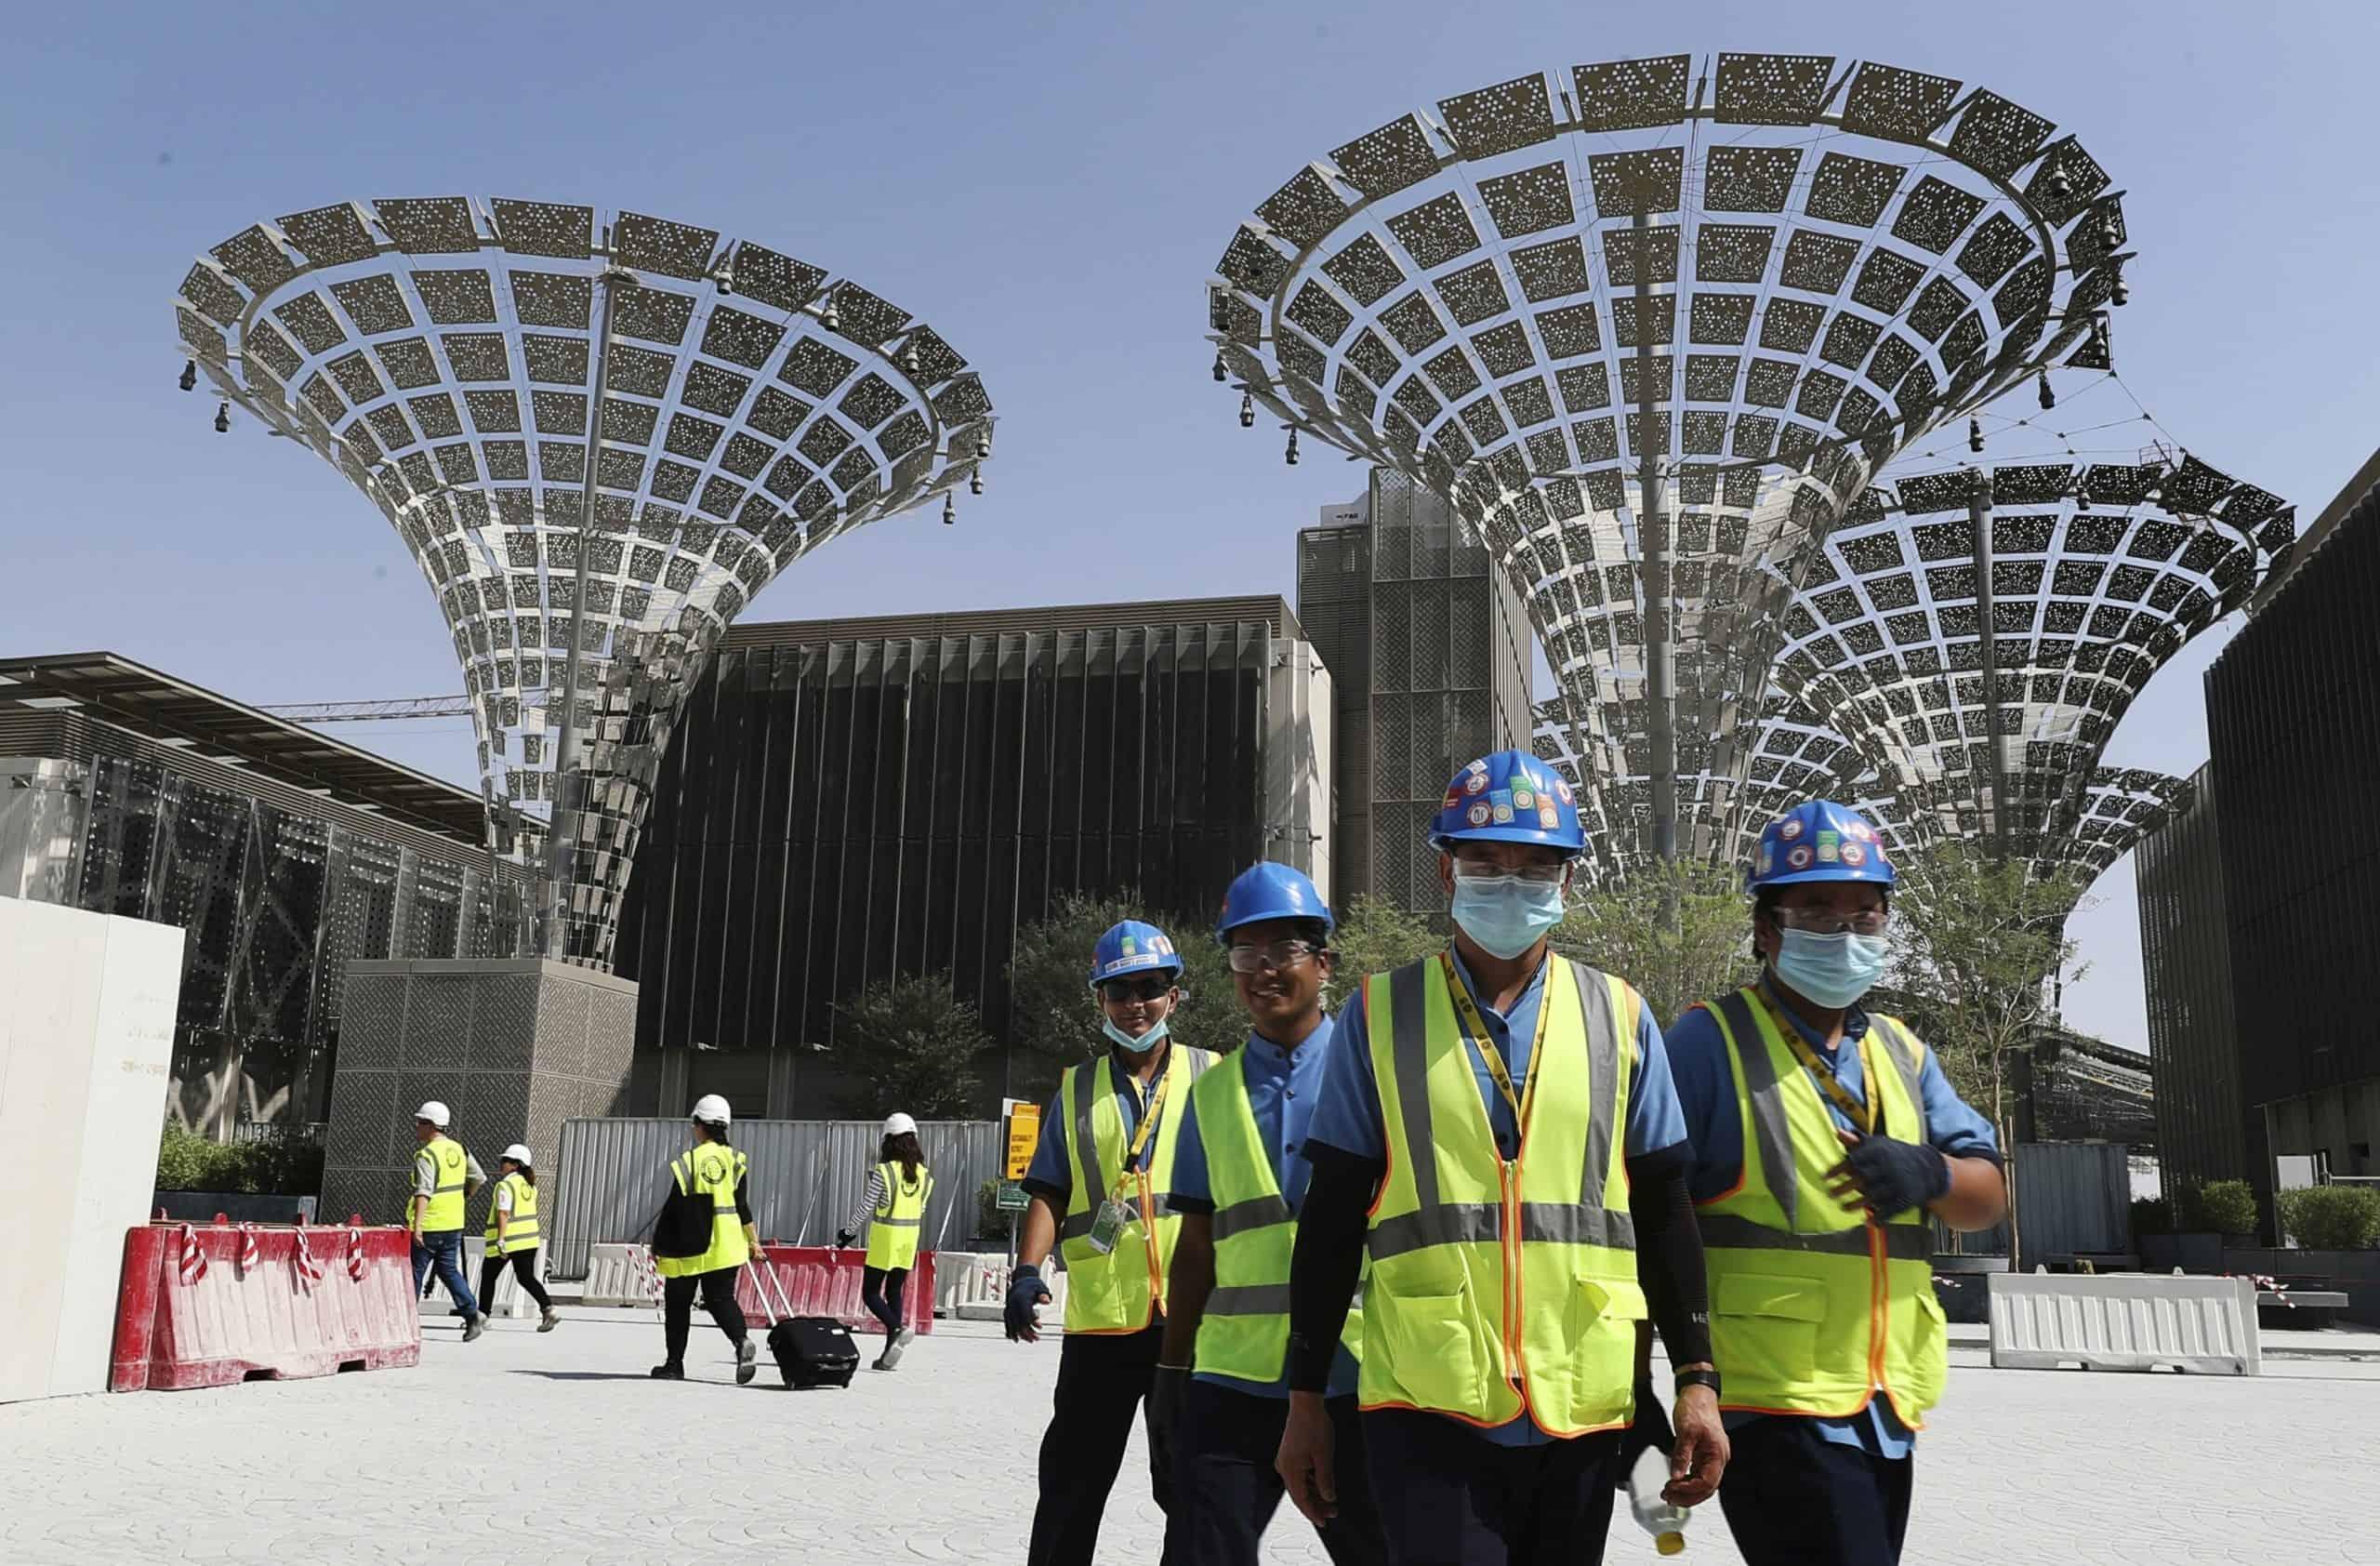 Dubai Expo 2020 Likely Postponed to 2021